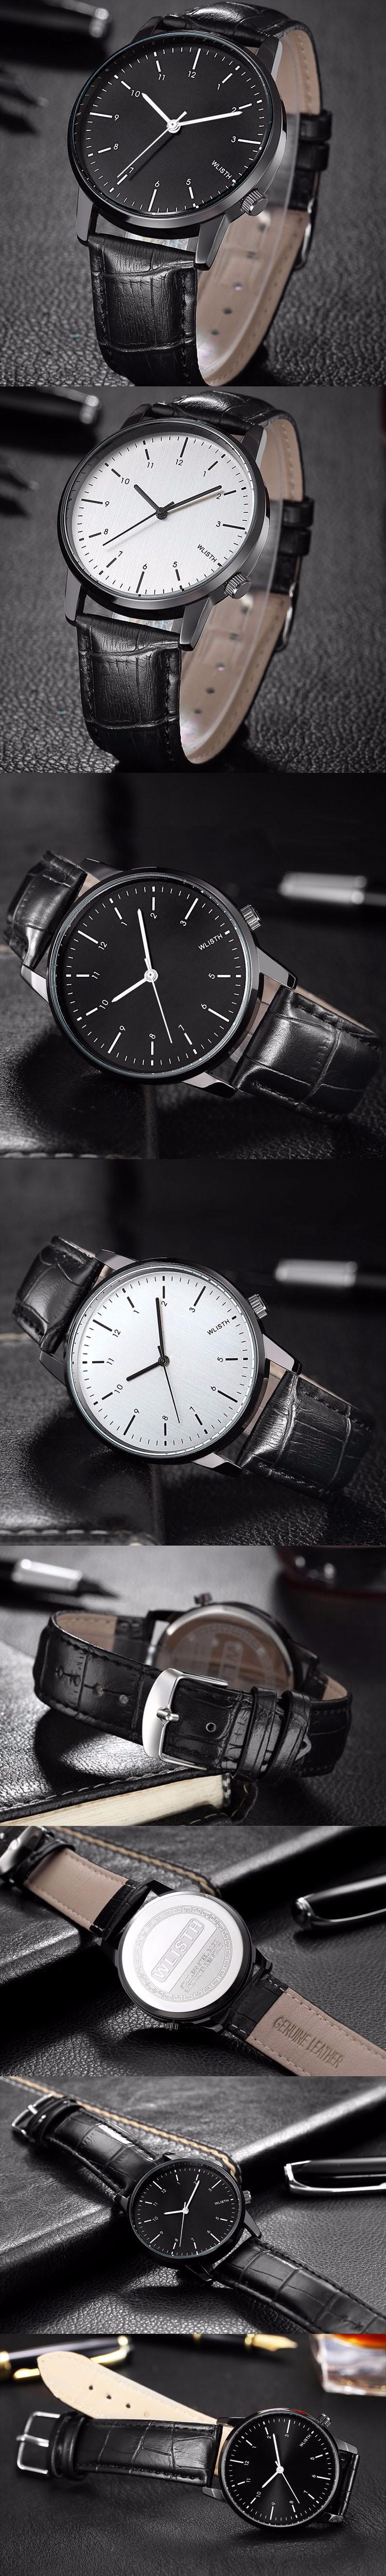 WLISTH Watch Men 2017 Casual Clock Top Brand Luxury Quartz Wrist Watches Male Wristwatch Quartz-Watch Relogio Masculino hodinky